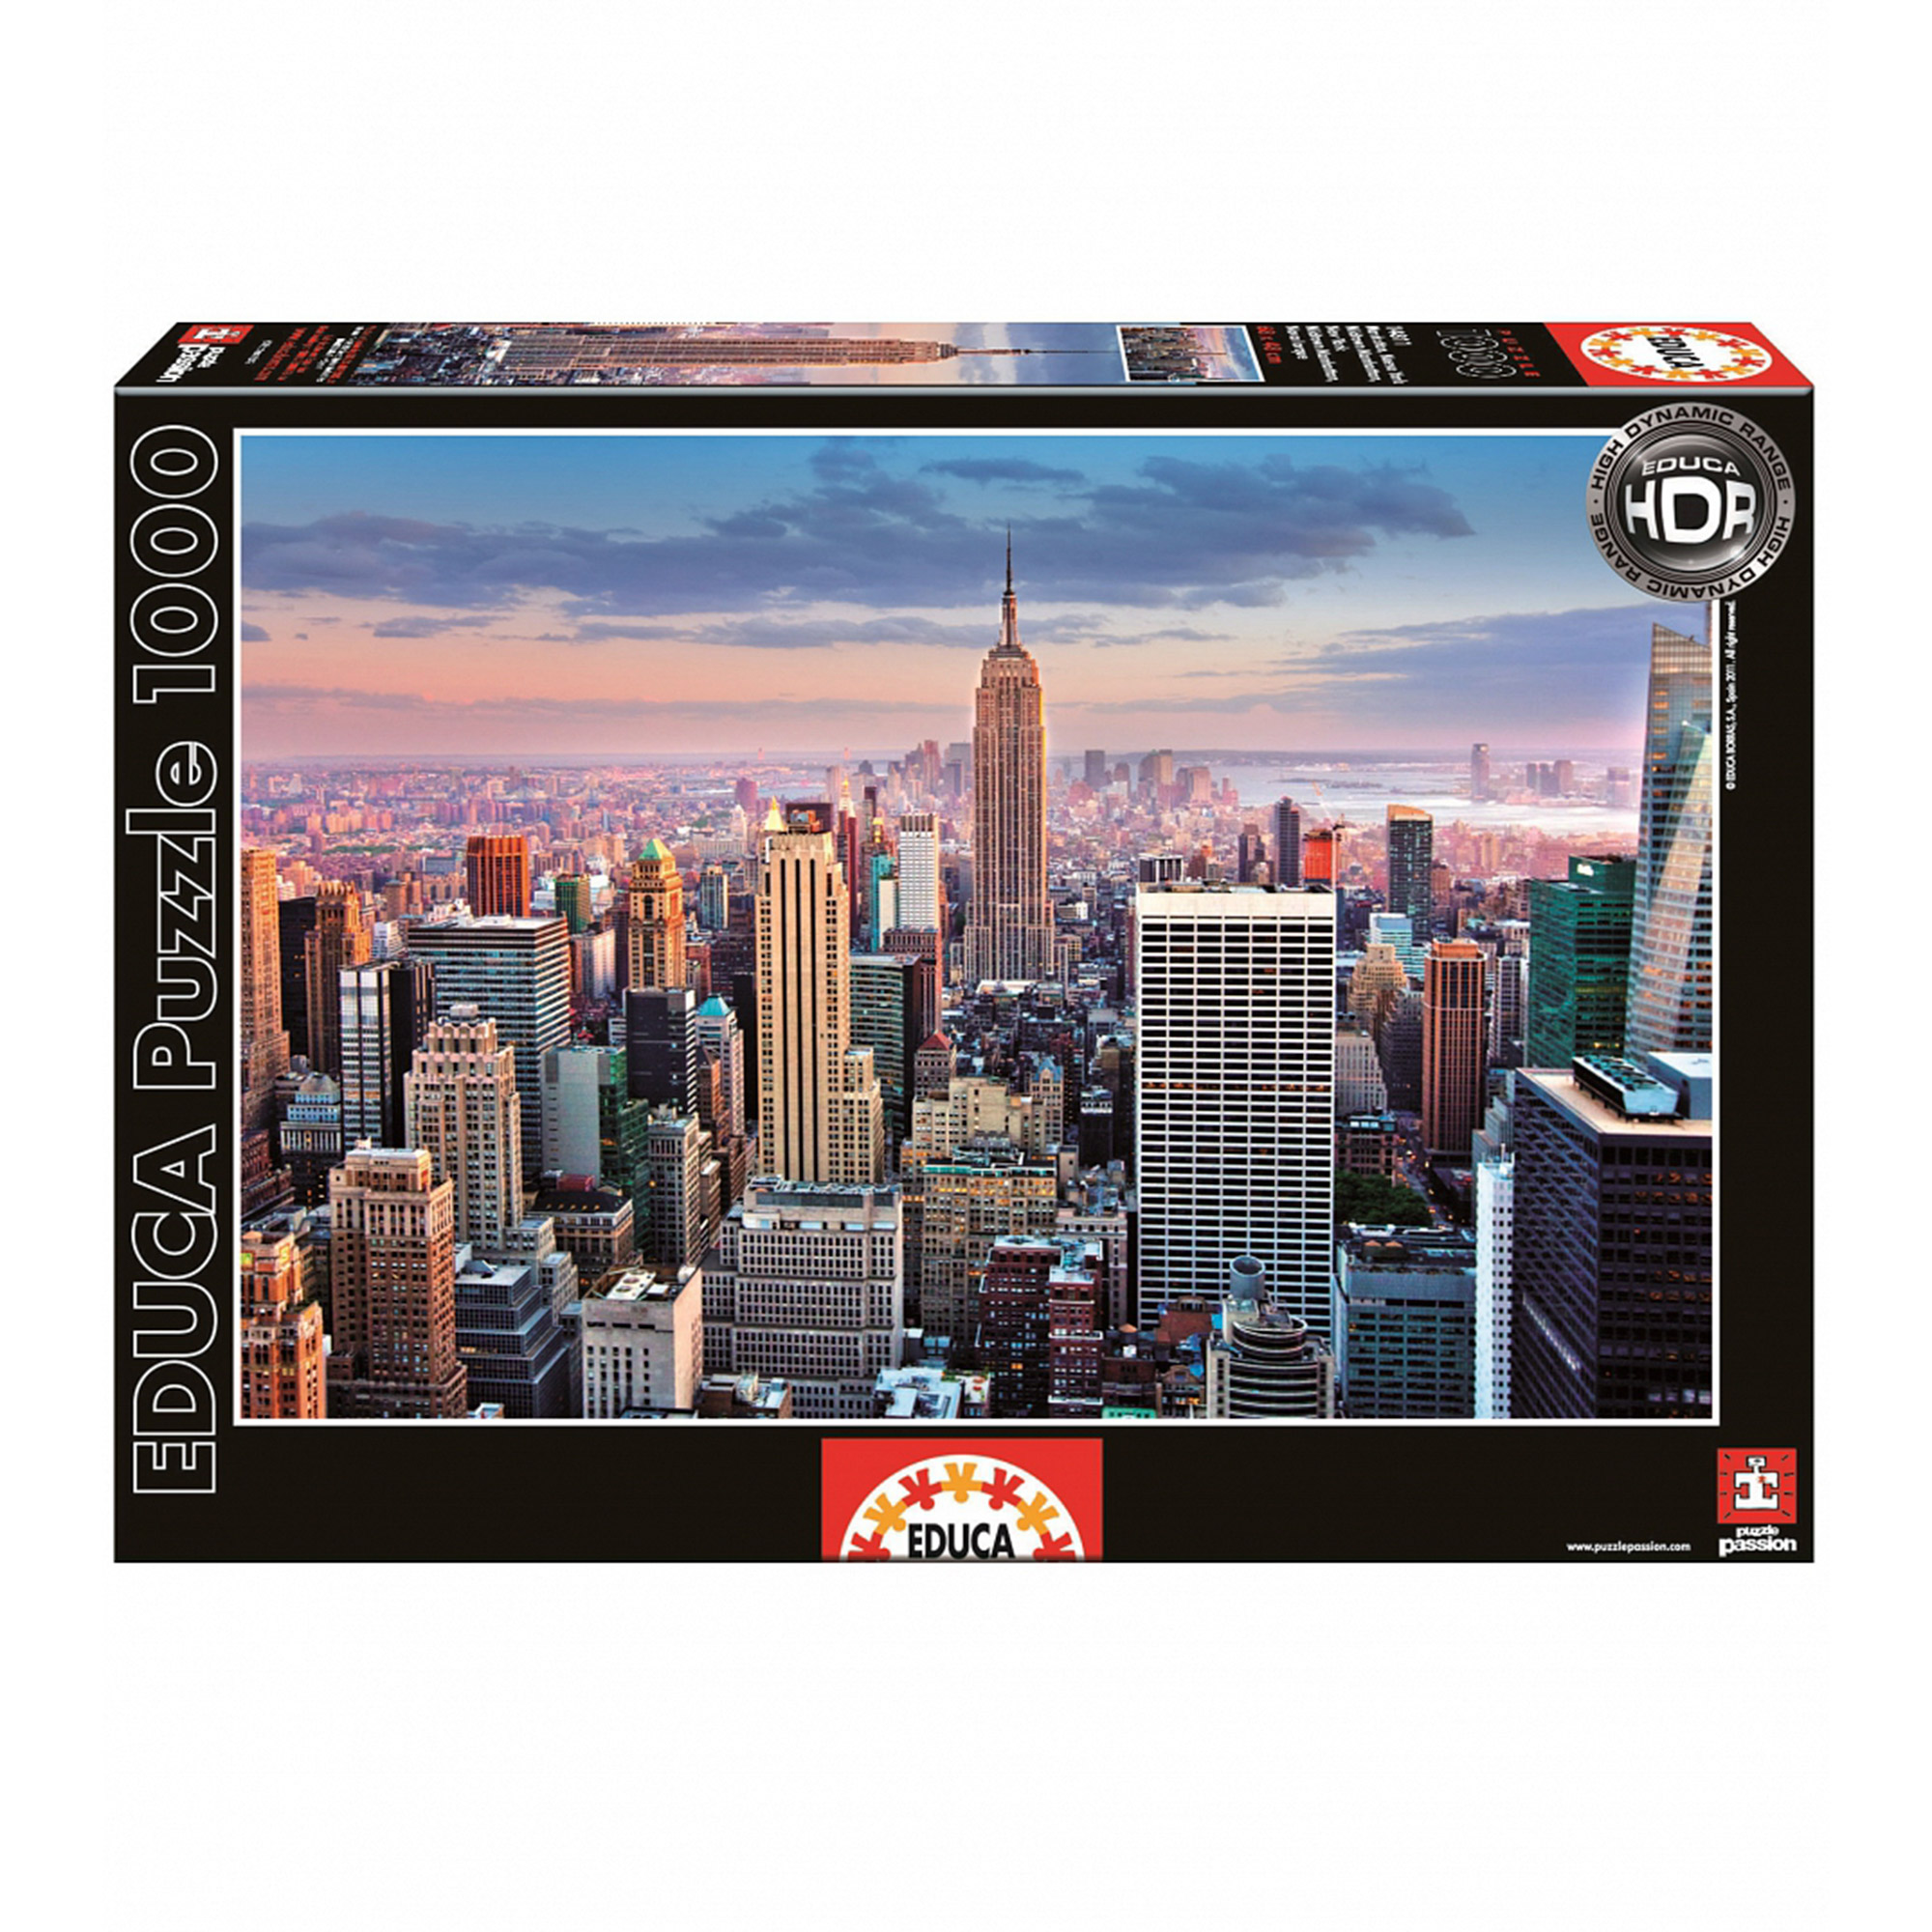 Фото - Пазл Educa Манхеттен, Нью-Йорк 1000 деталей пазл educa мир банкнот 1000 деталей